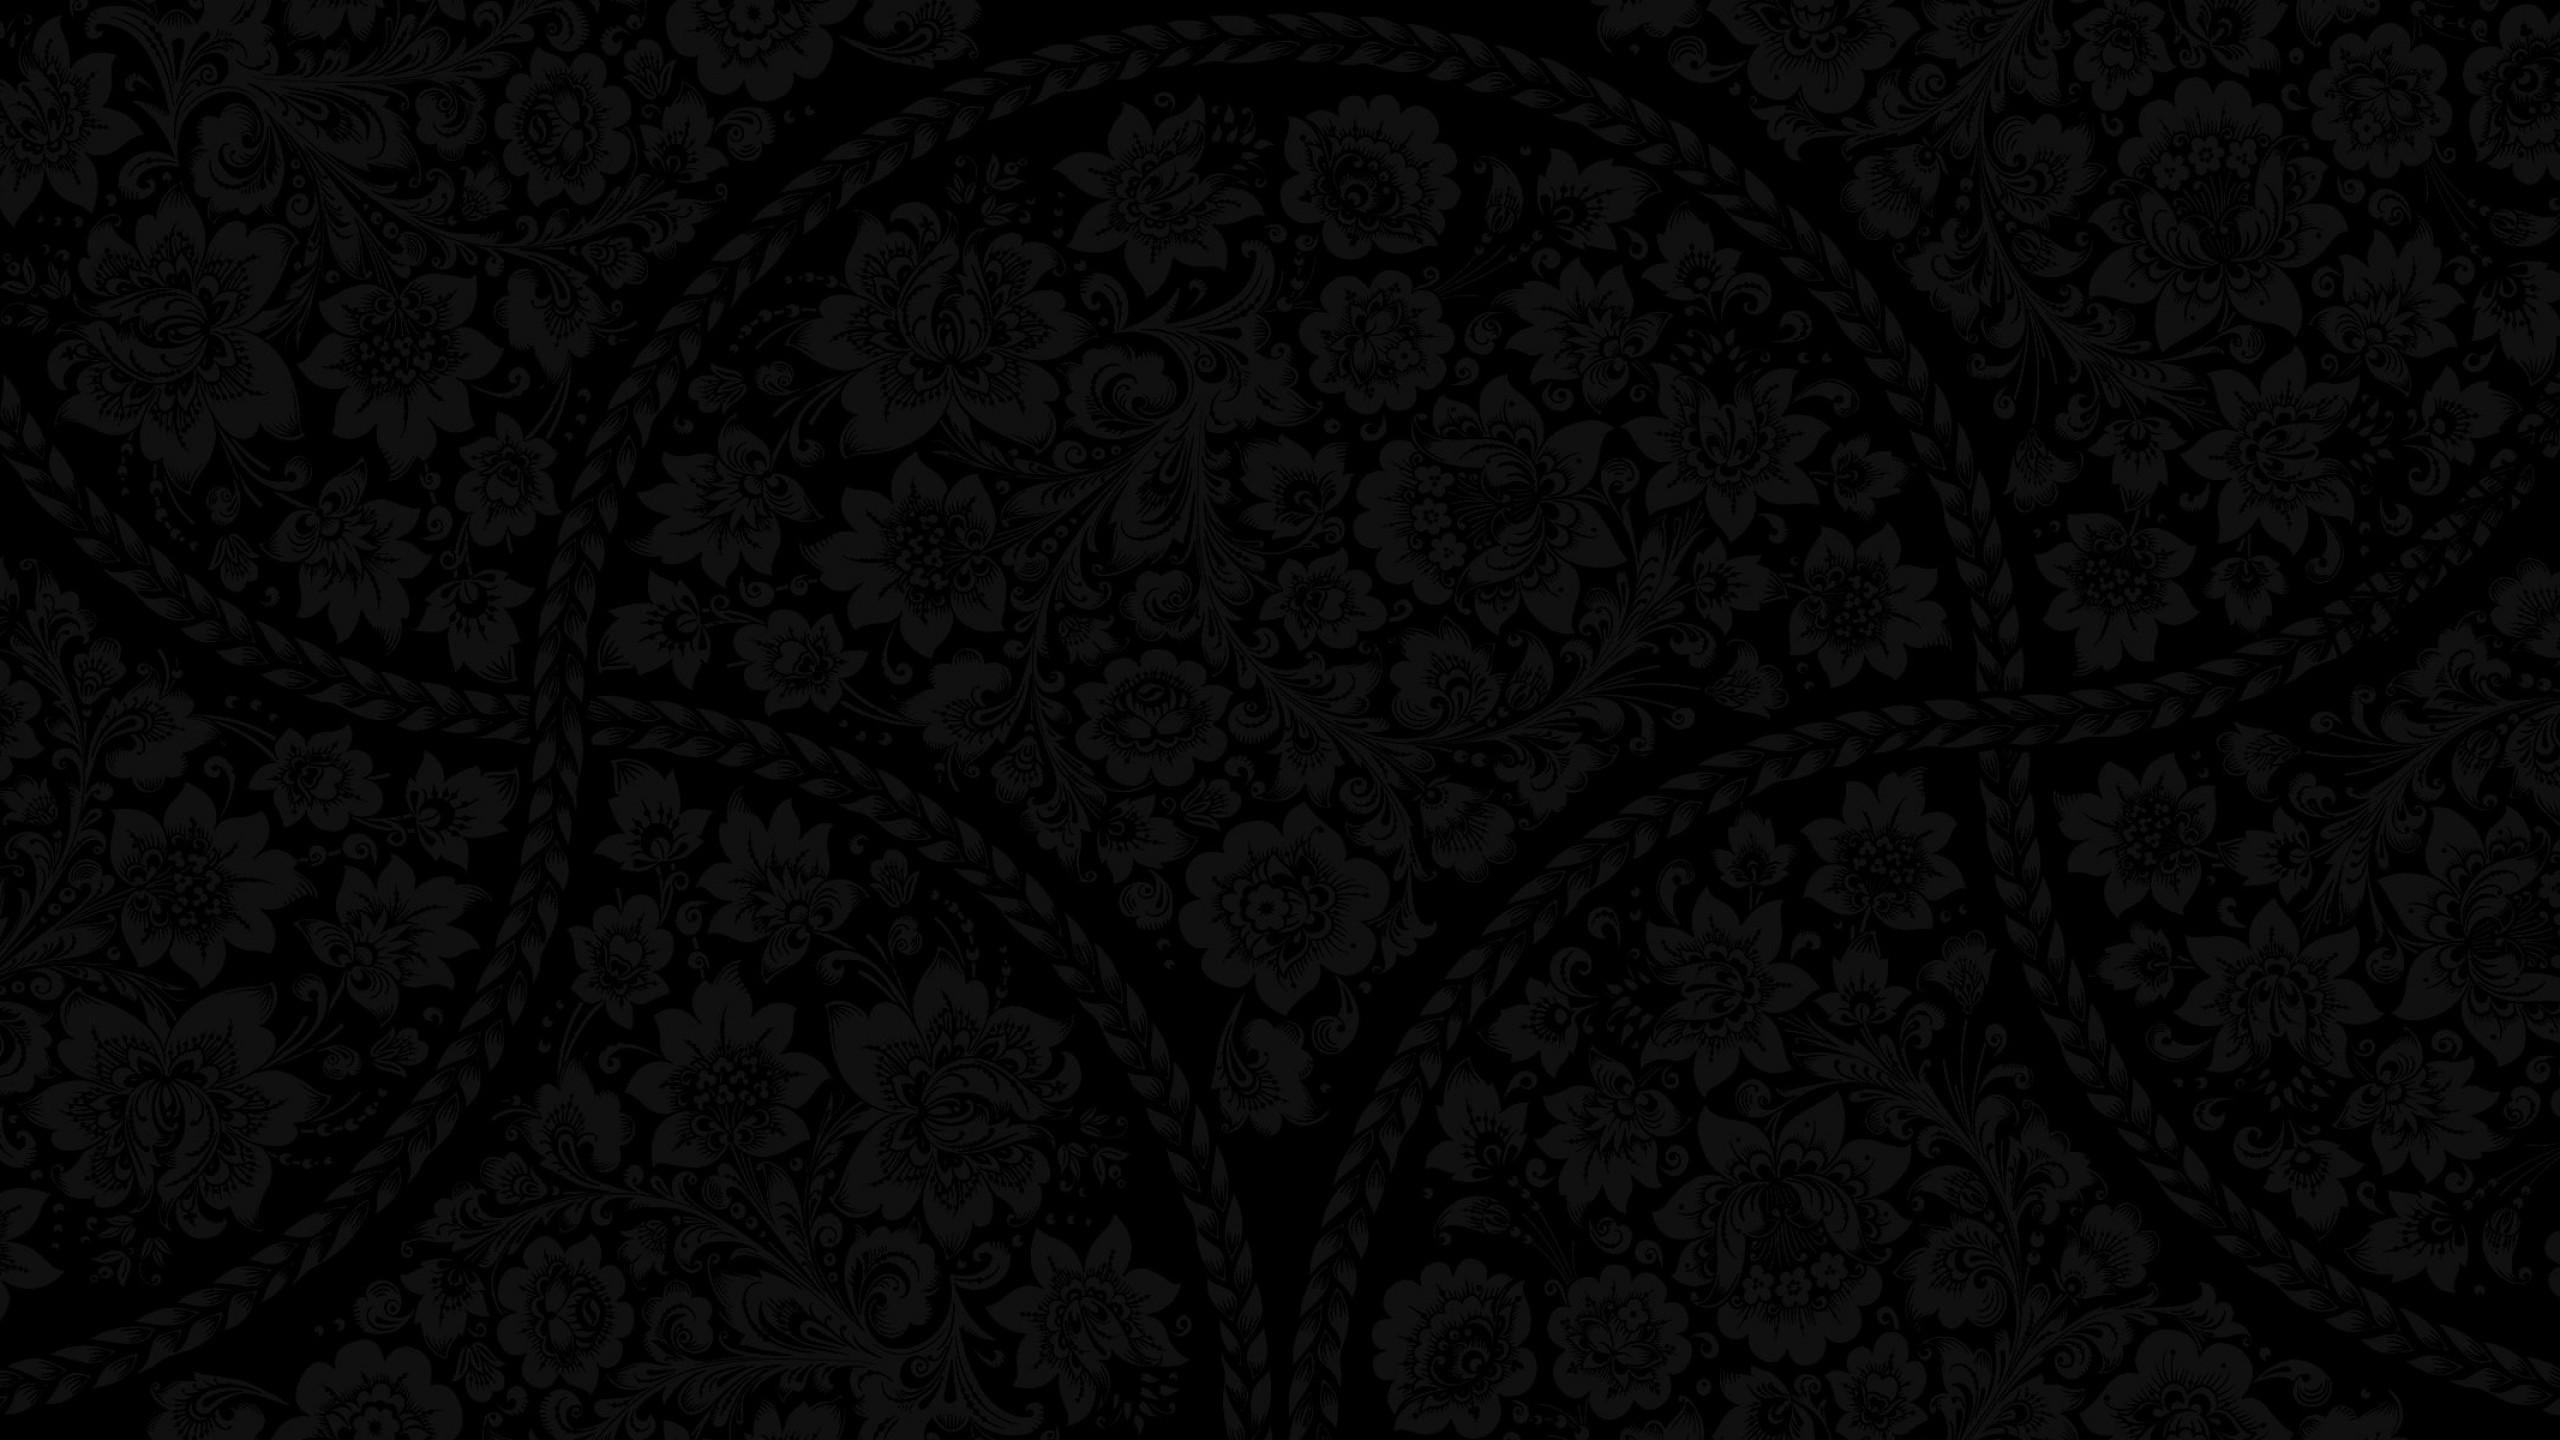 Wallpaper color, pattern, texture, background, dark